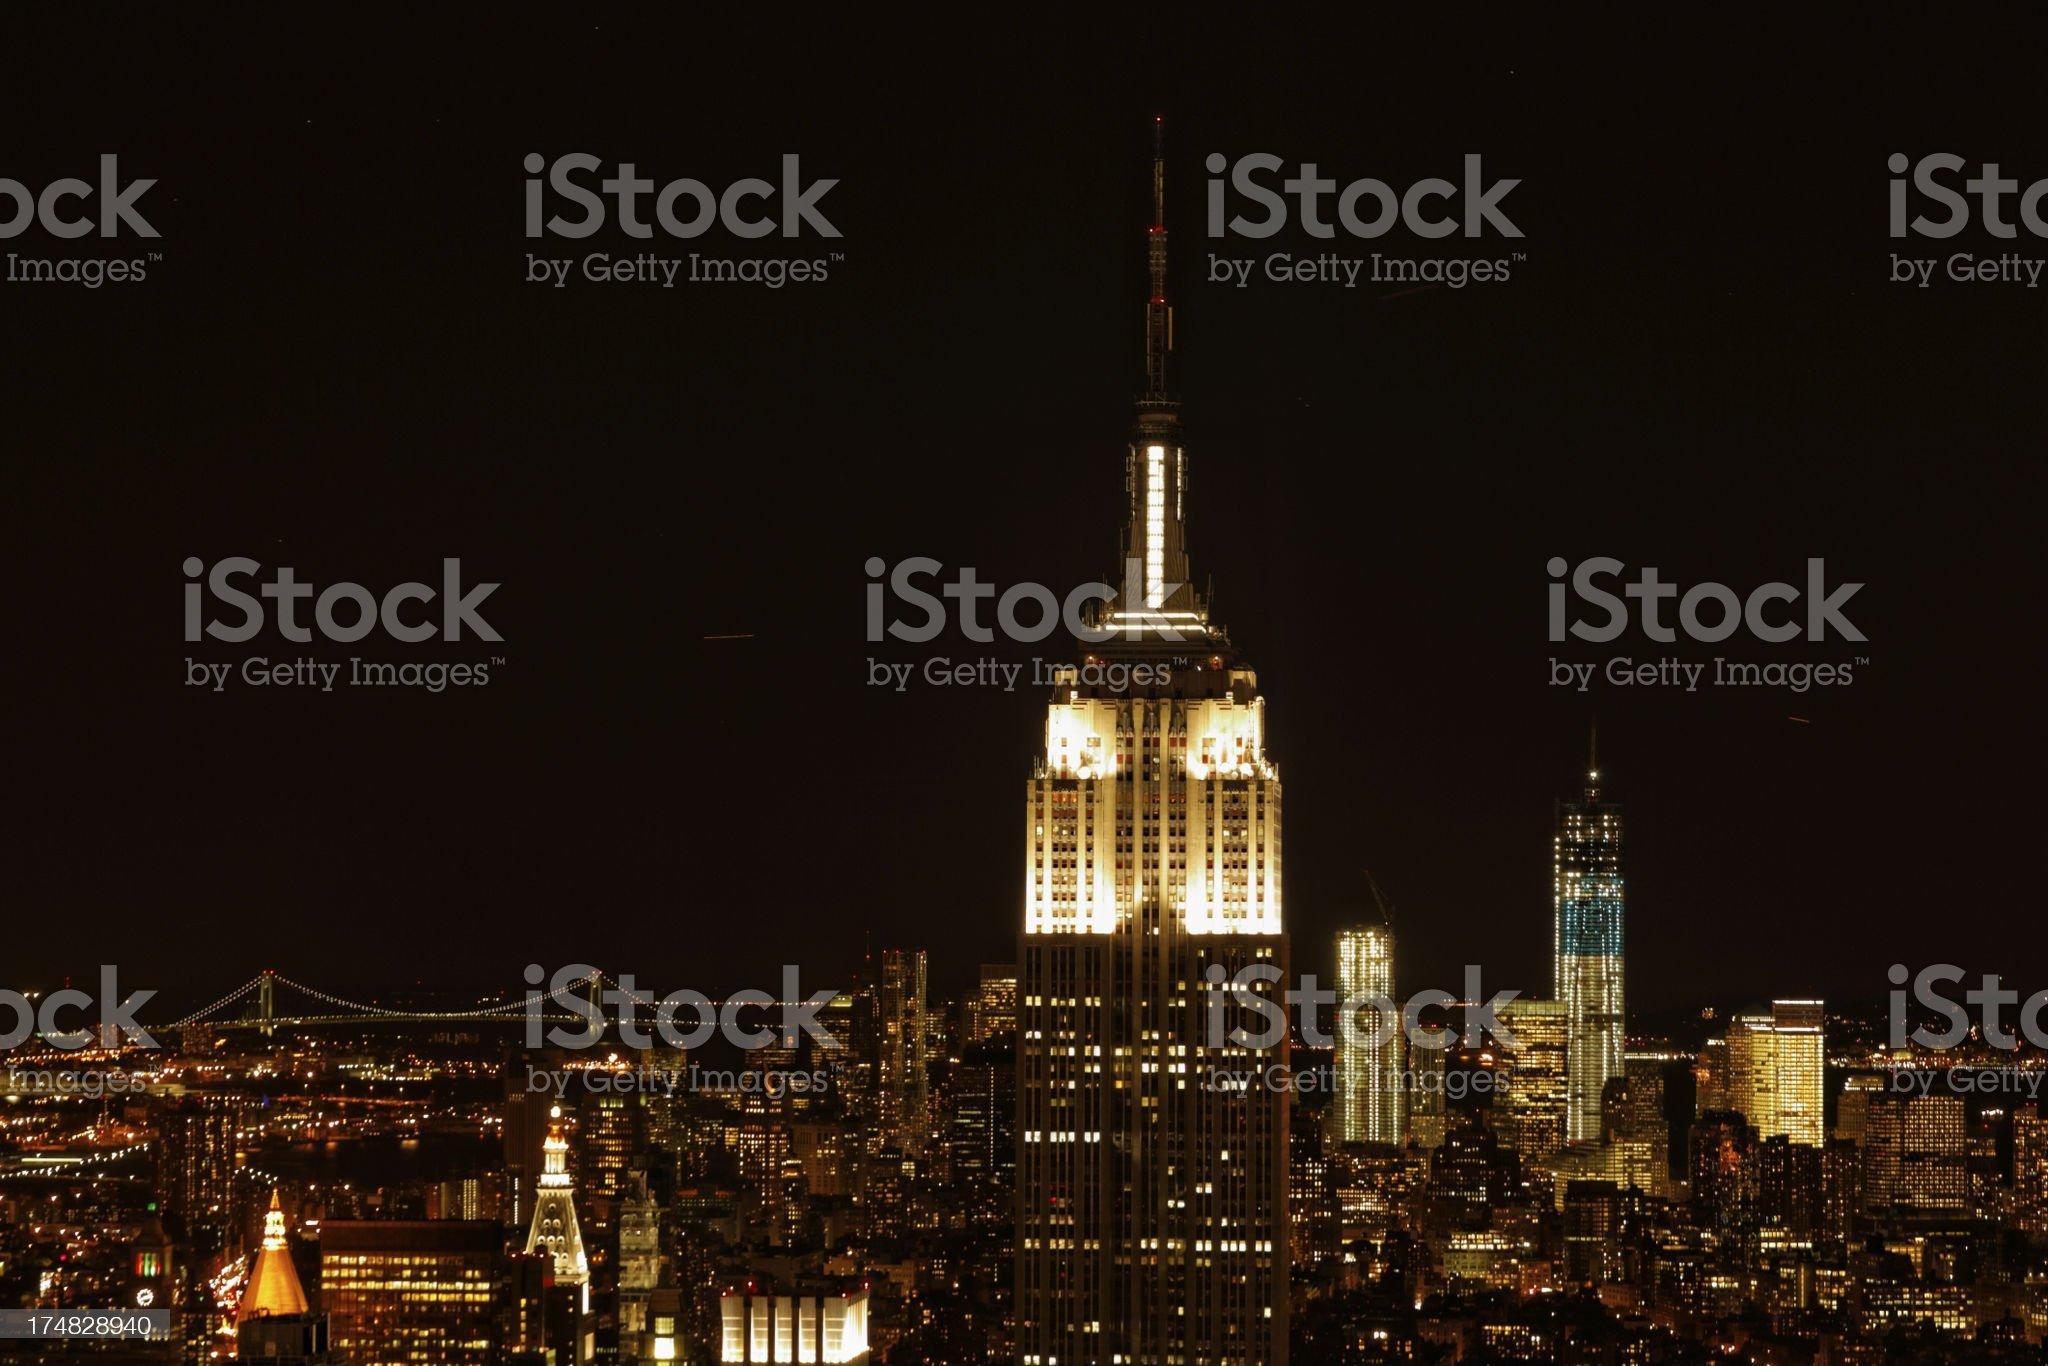 New York city at night XXXL royalty-free stock photo